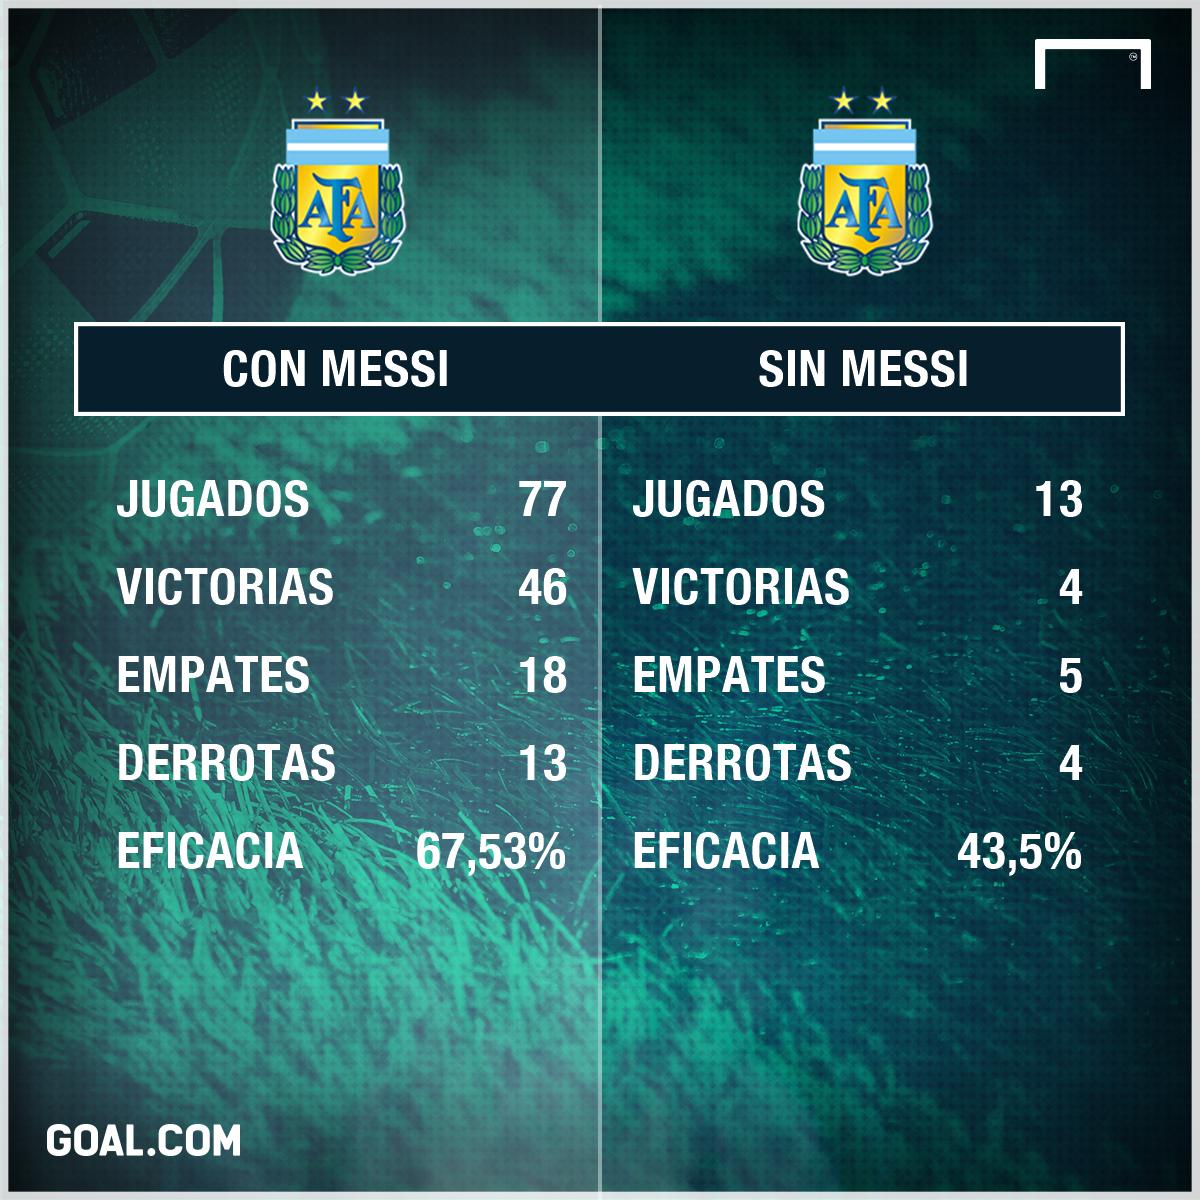 Argentina con sin messi